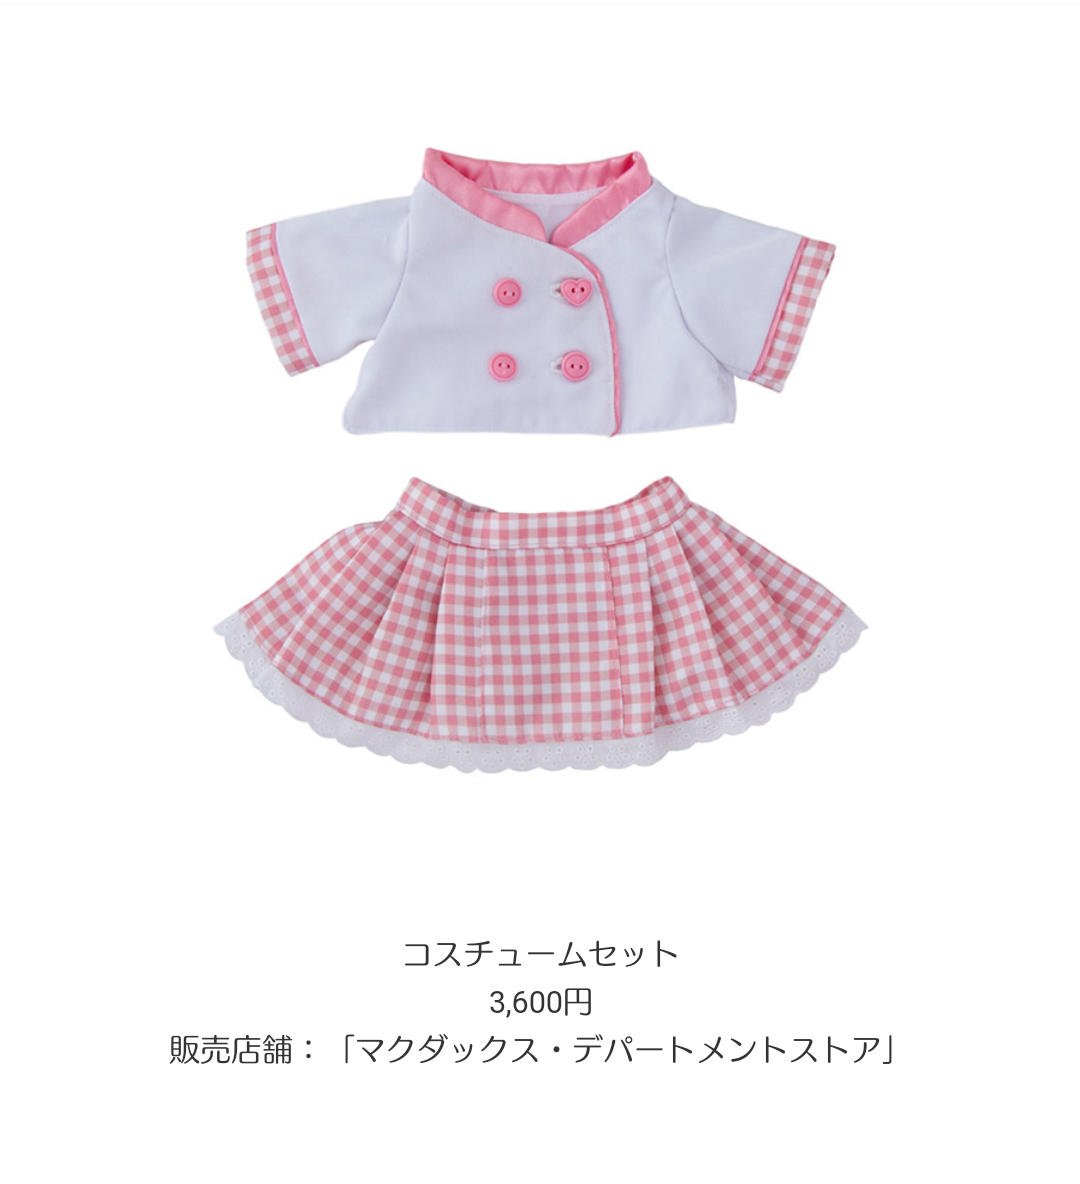 f:id:ichiko-disneyblog:20191021173027p:plain